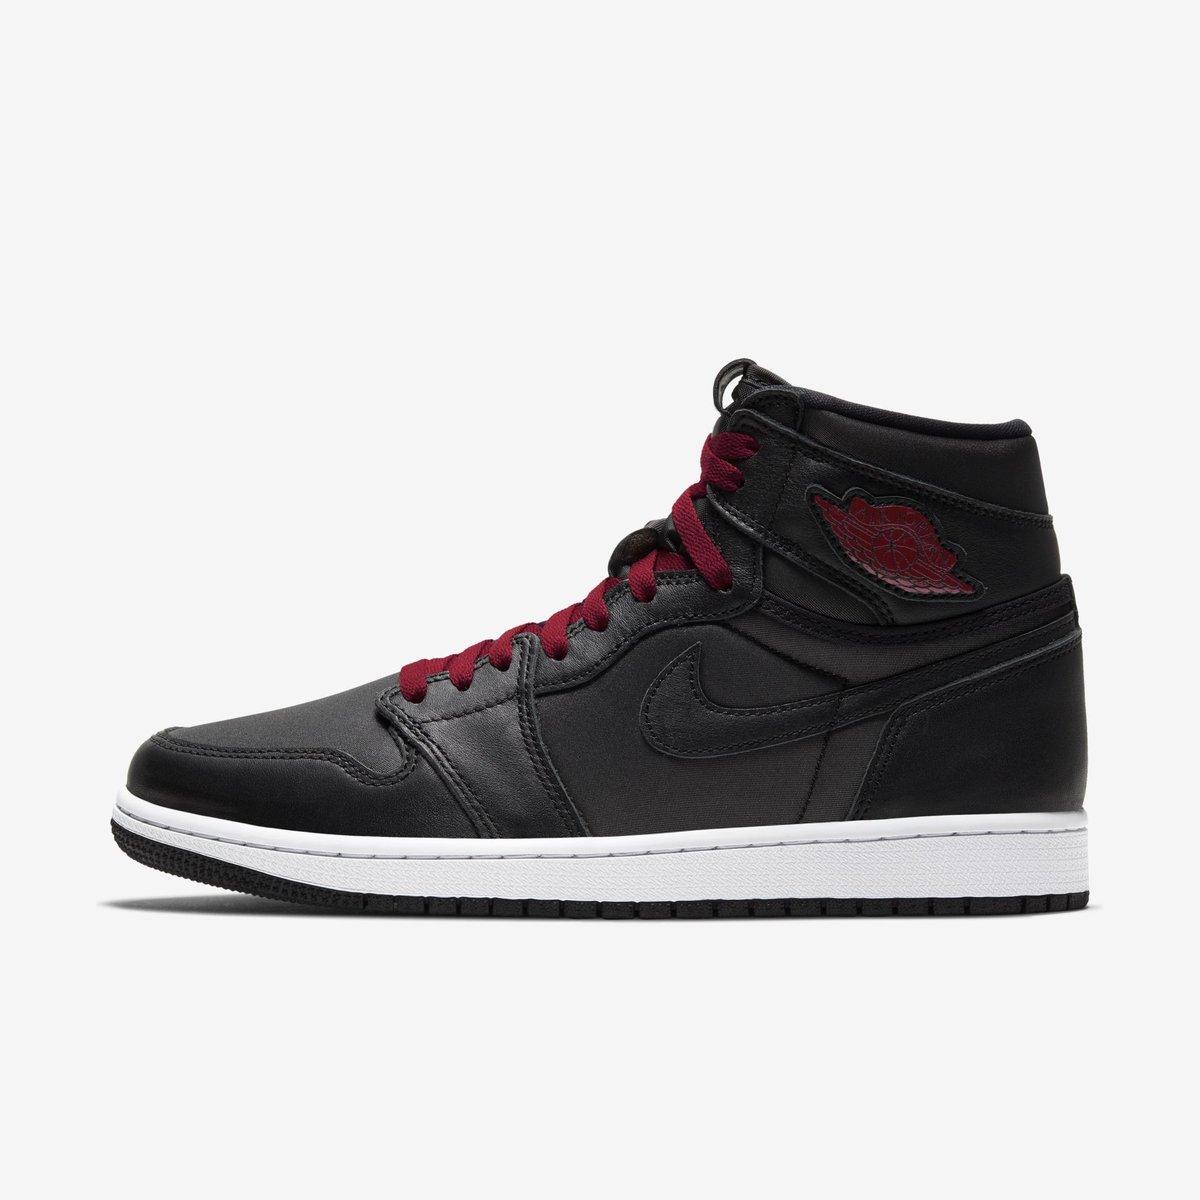 "ENDS TONIGHT: Jordan 1 Retro High OG ""Black Satin"" $89.23 on @nikestore with code LOGIN25 Link -> go.j23app.com/fhf"